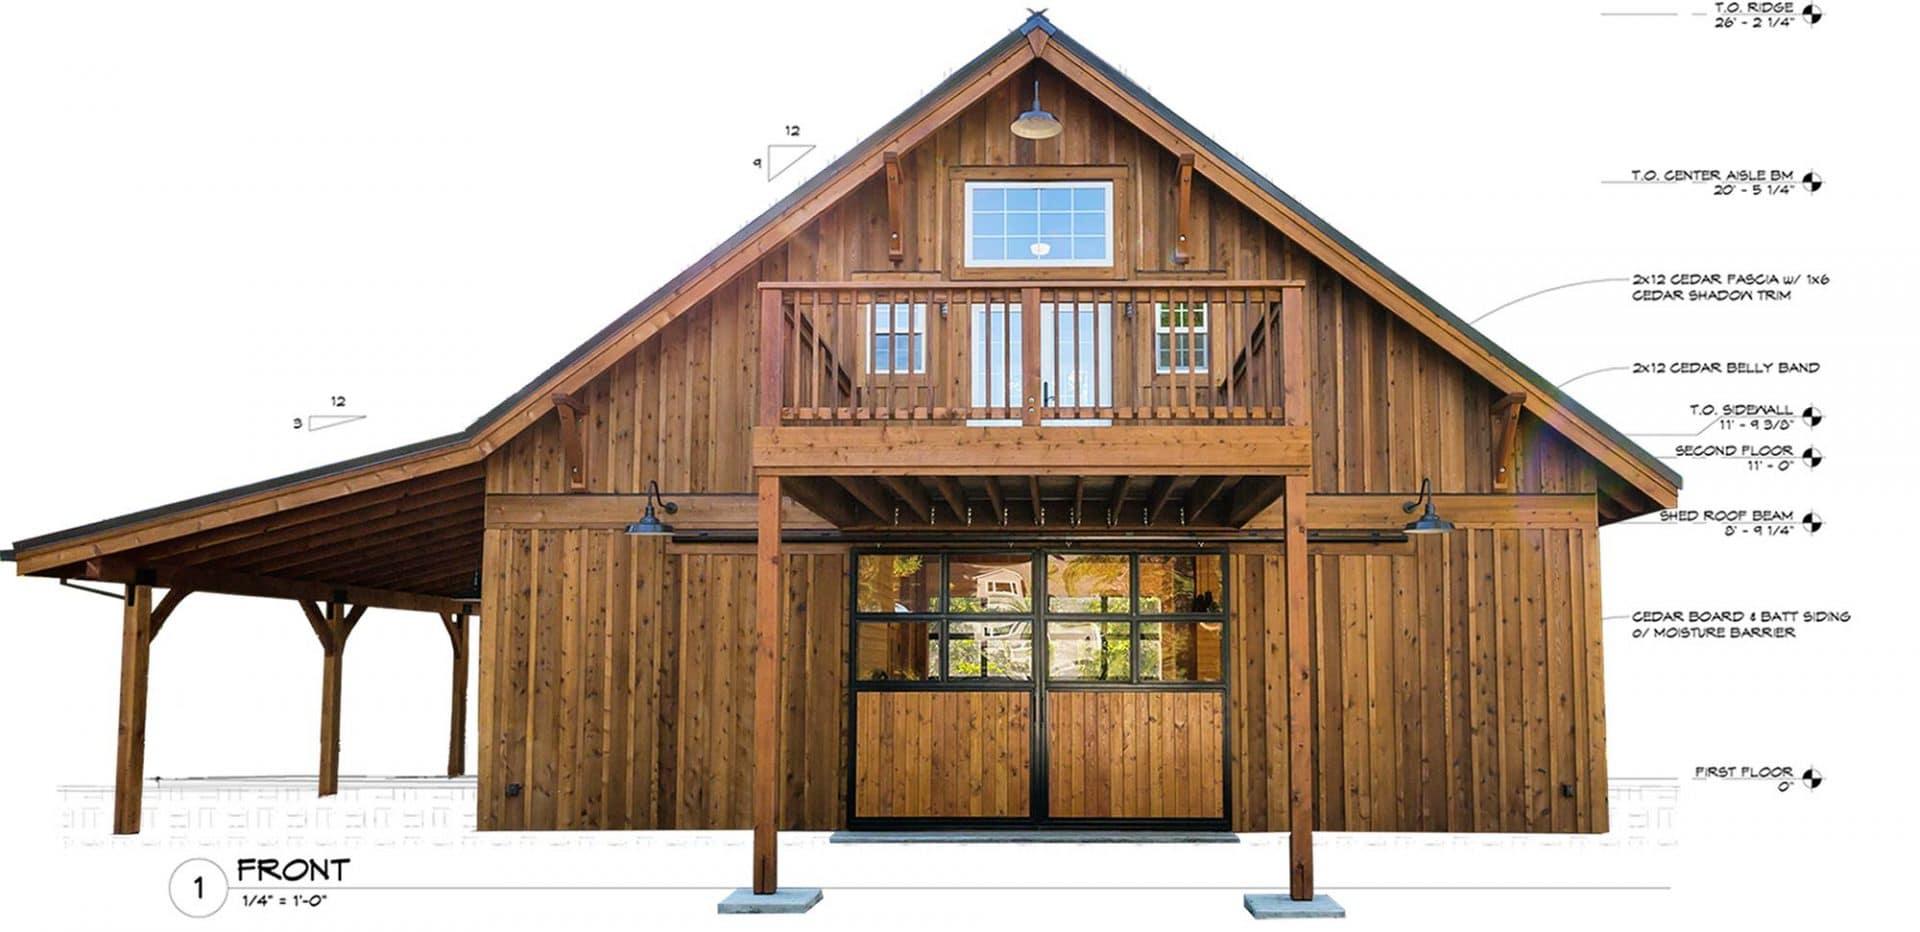 Diy post and beam barn kits diy do it your self for Post and beam barn home kits